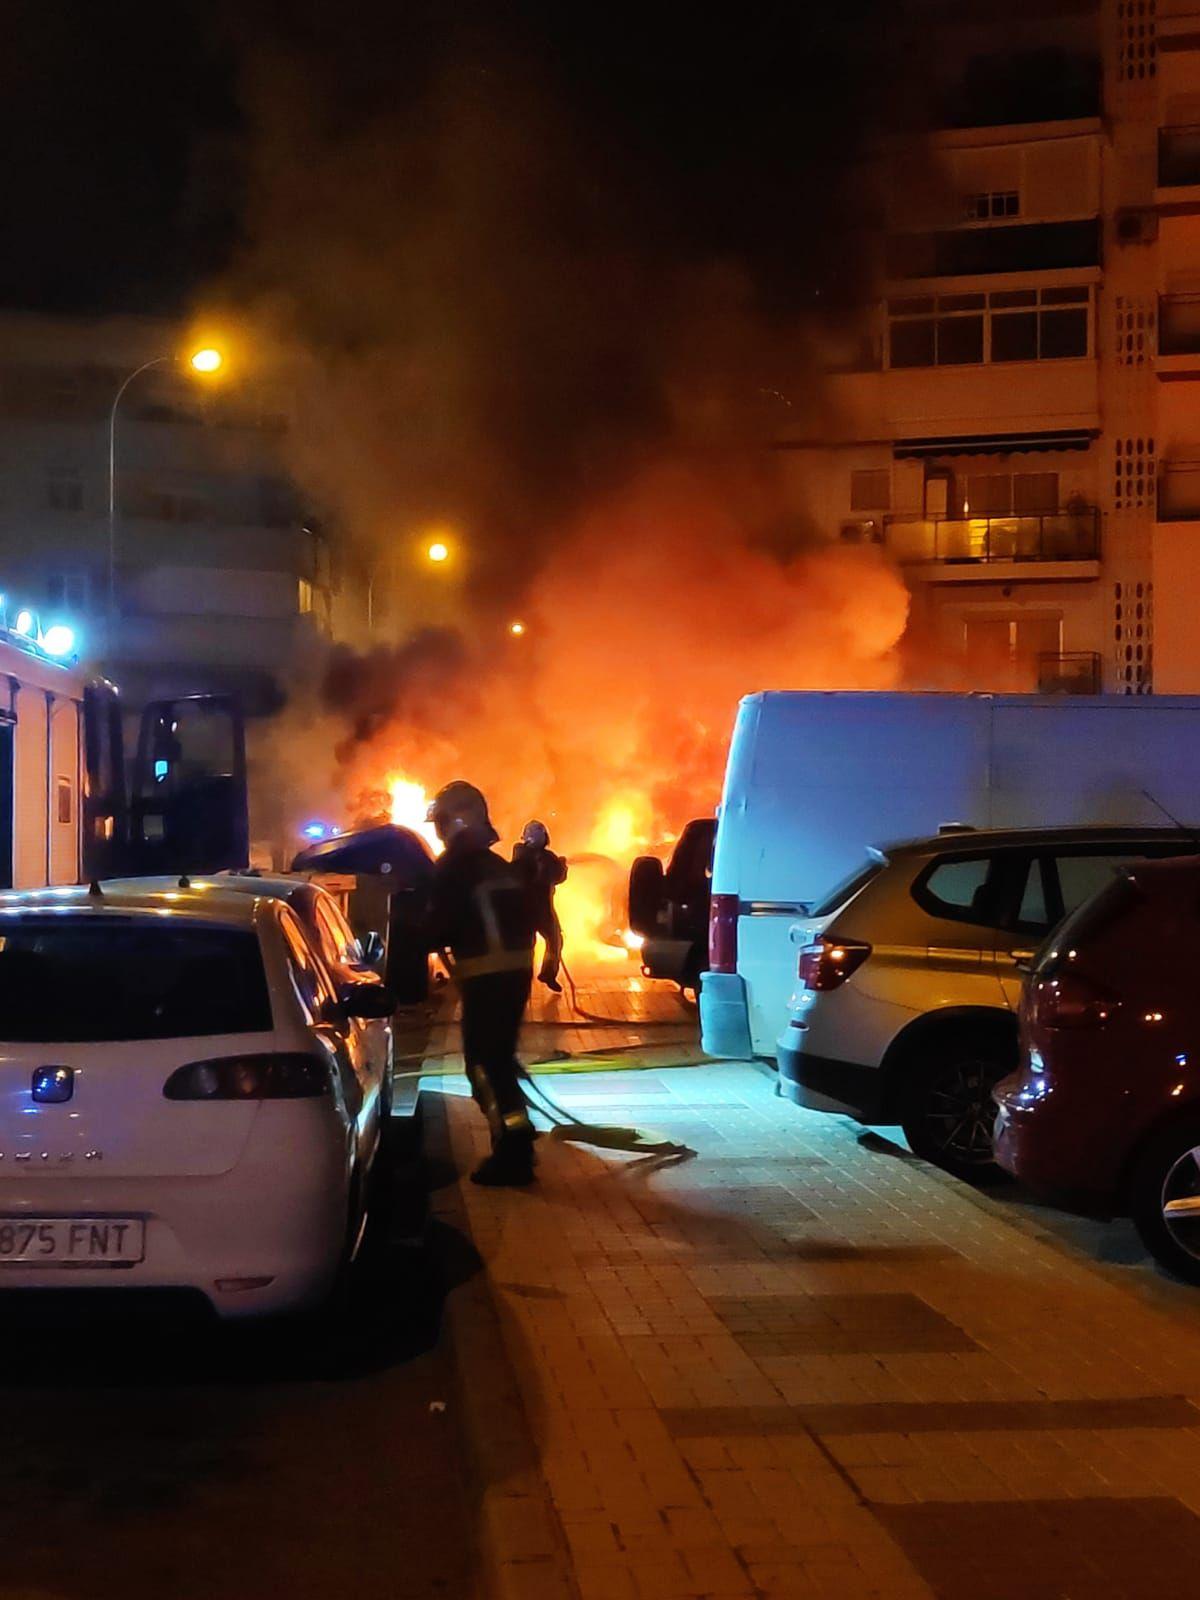 Aparatoso incendio de varios vehículos en Vélez-Málaga